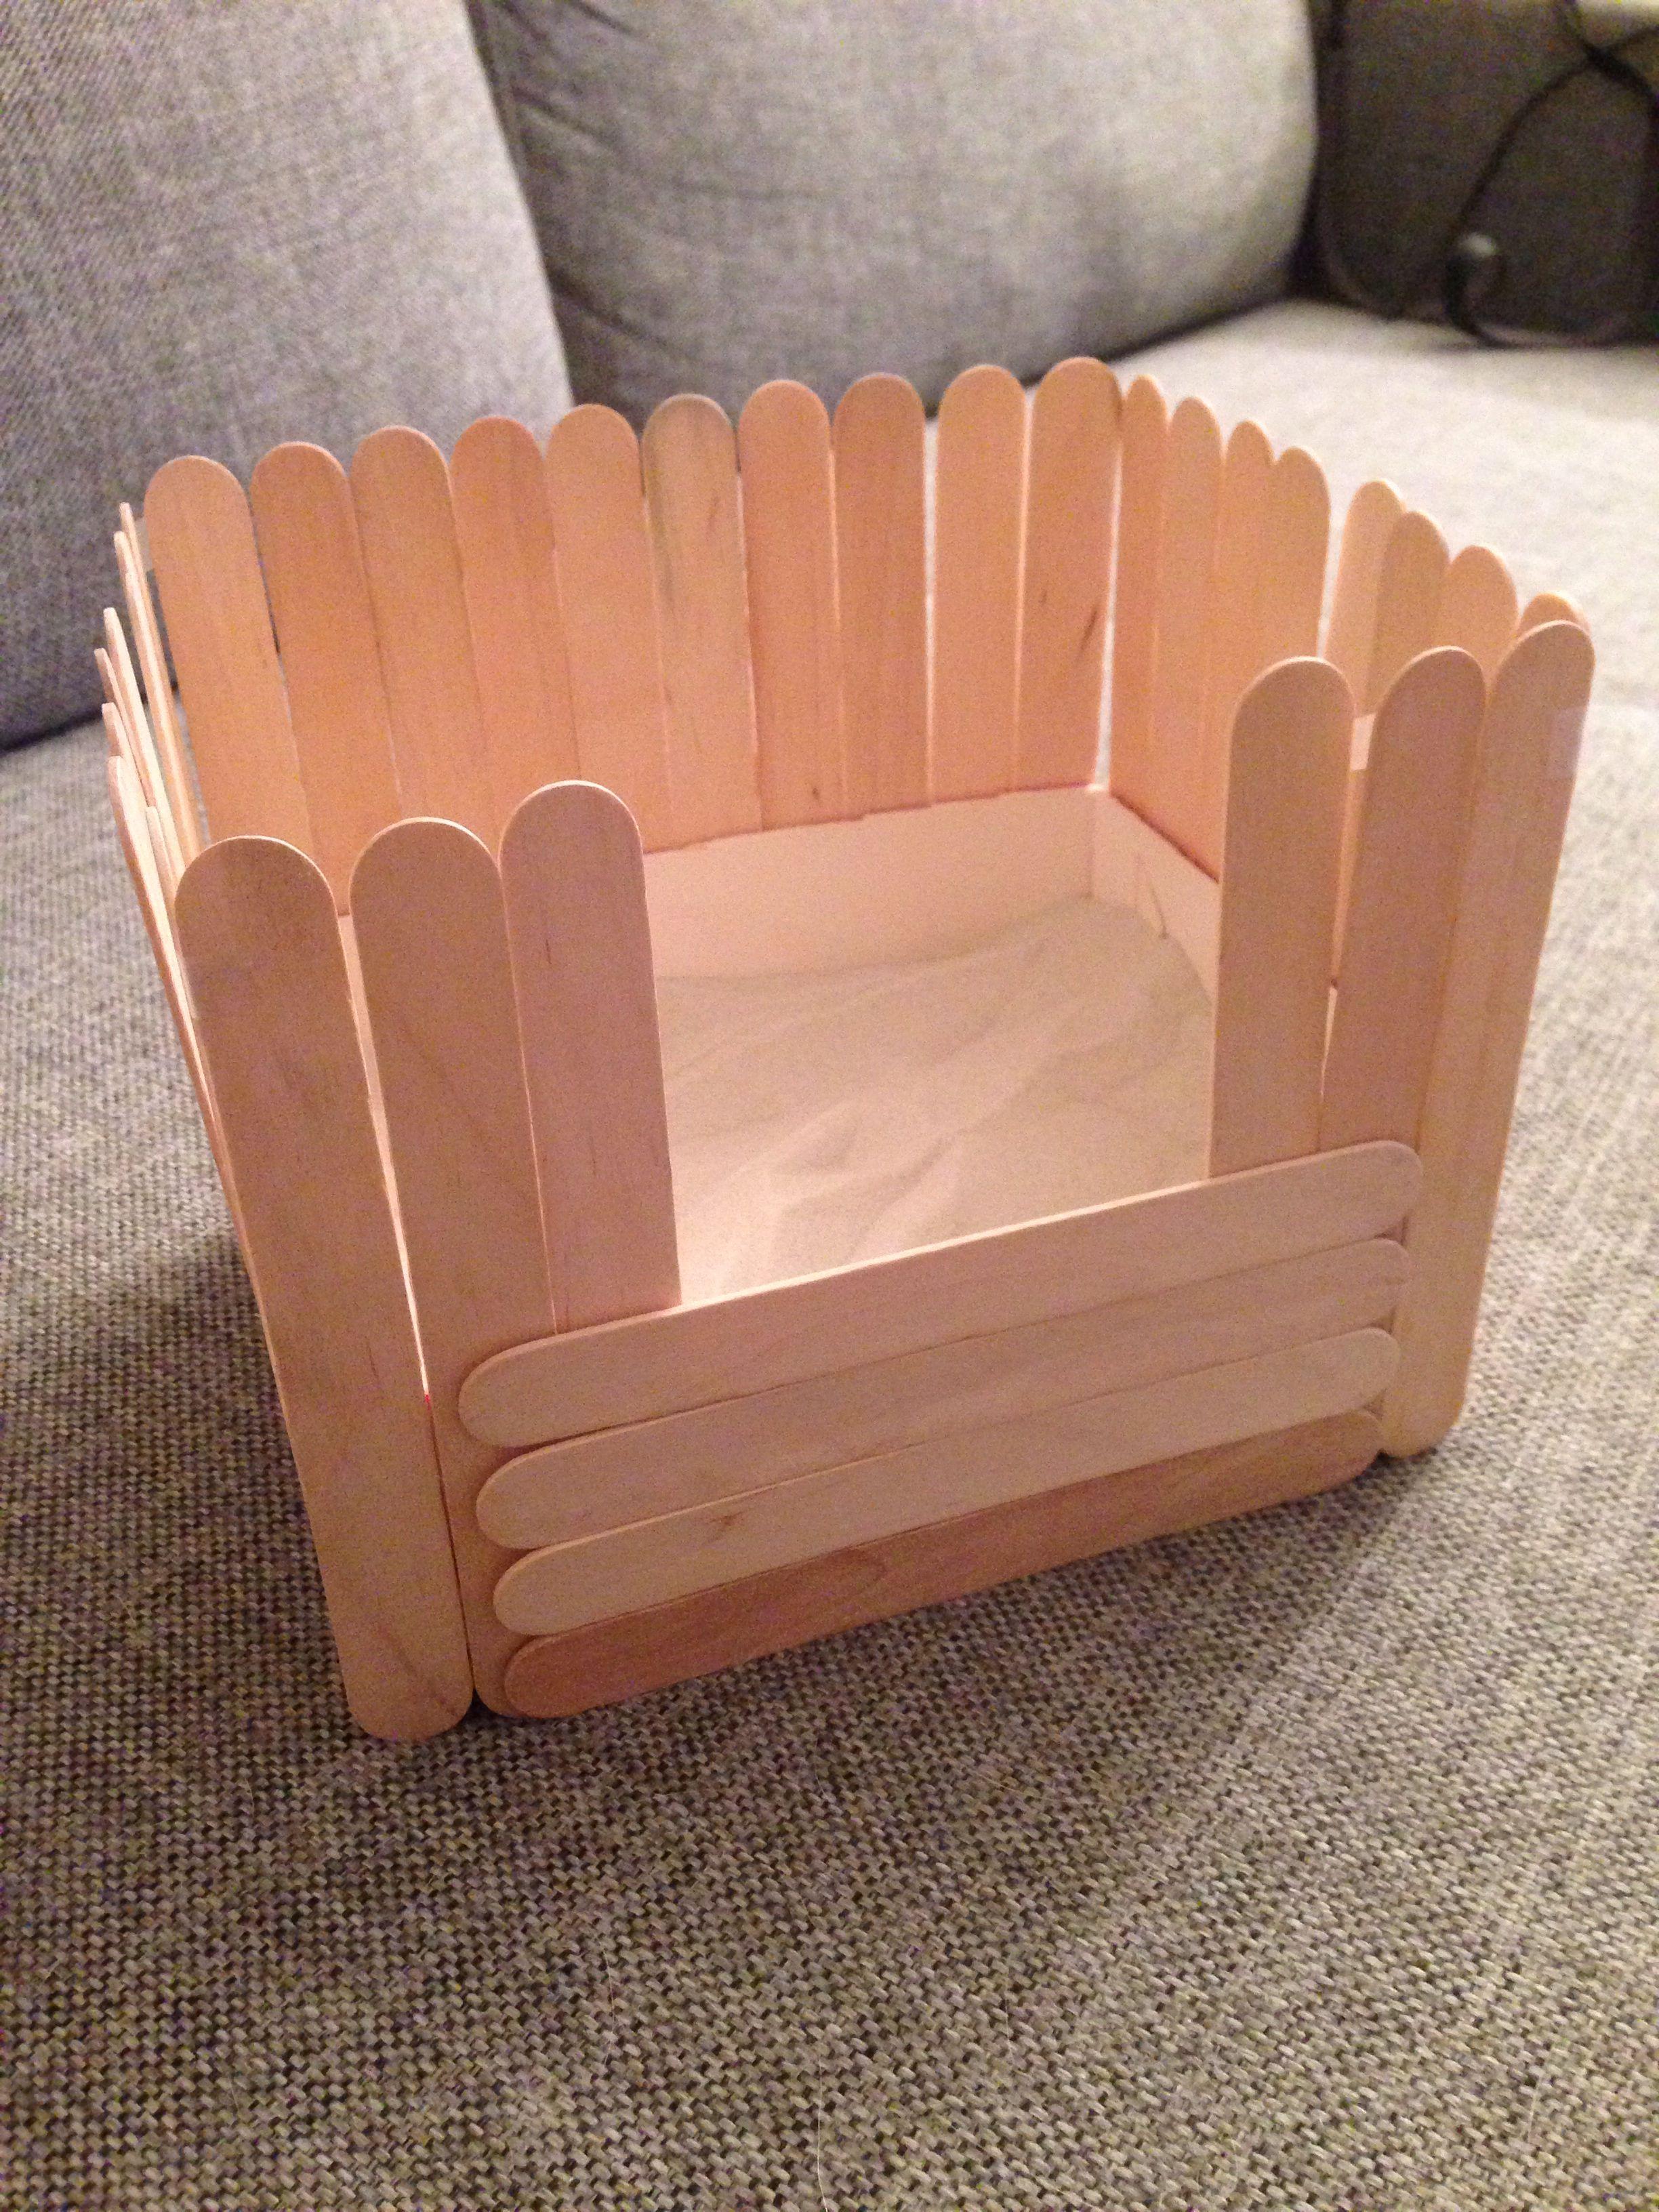 DIY Hamster Sand Bath … | J\'s | Pinterest | Bath, Hamster stuff and ...